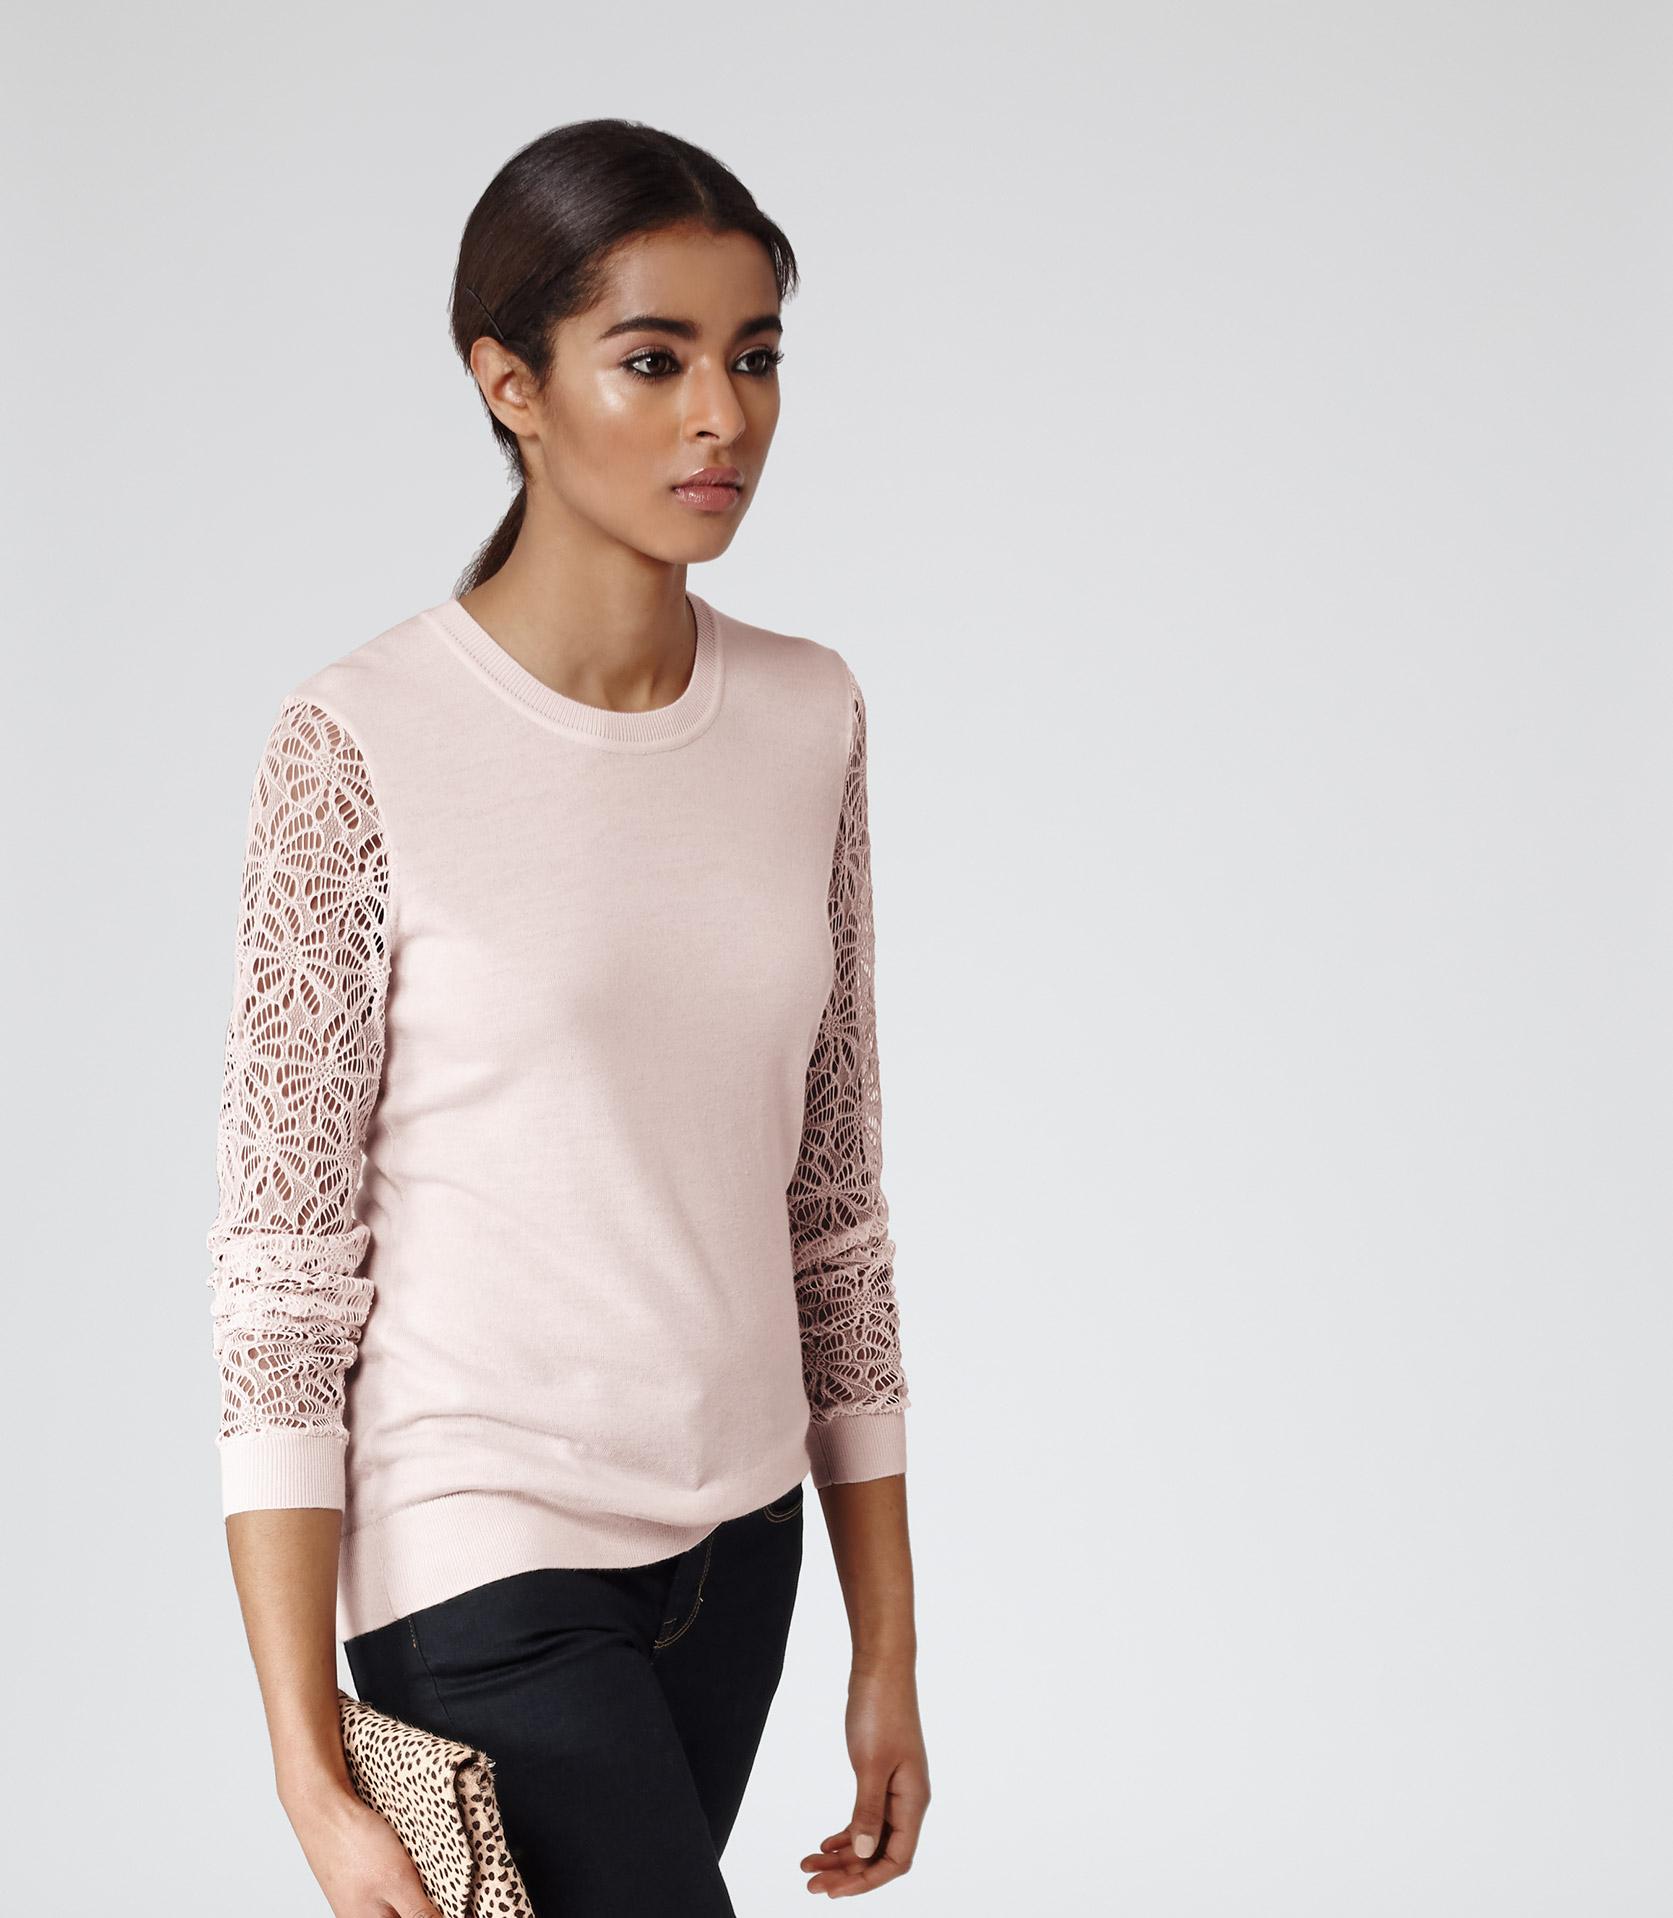 jumper clothing women 2014